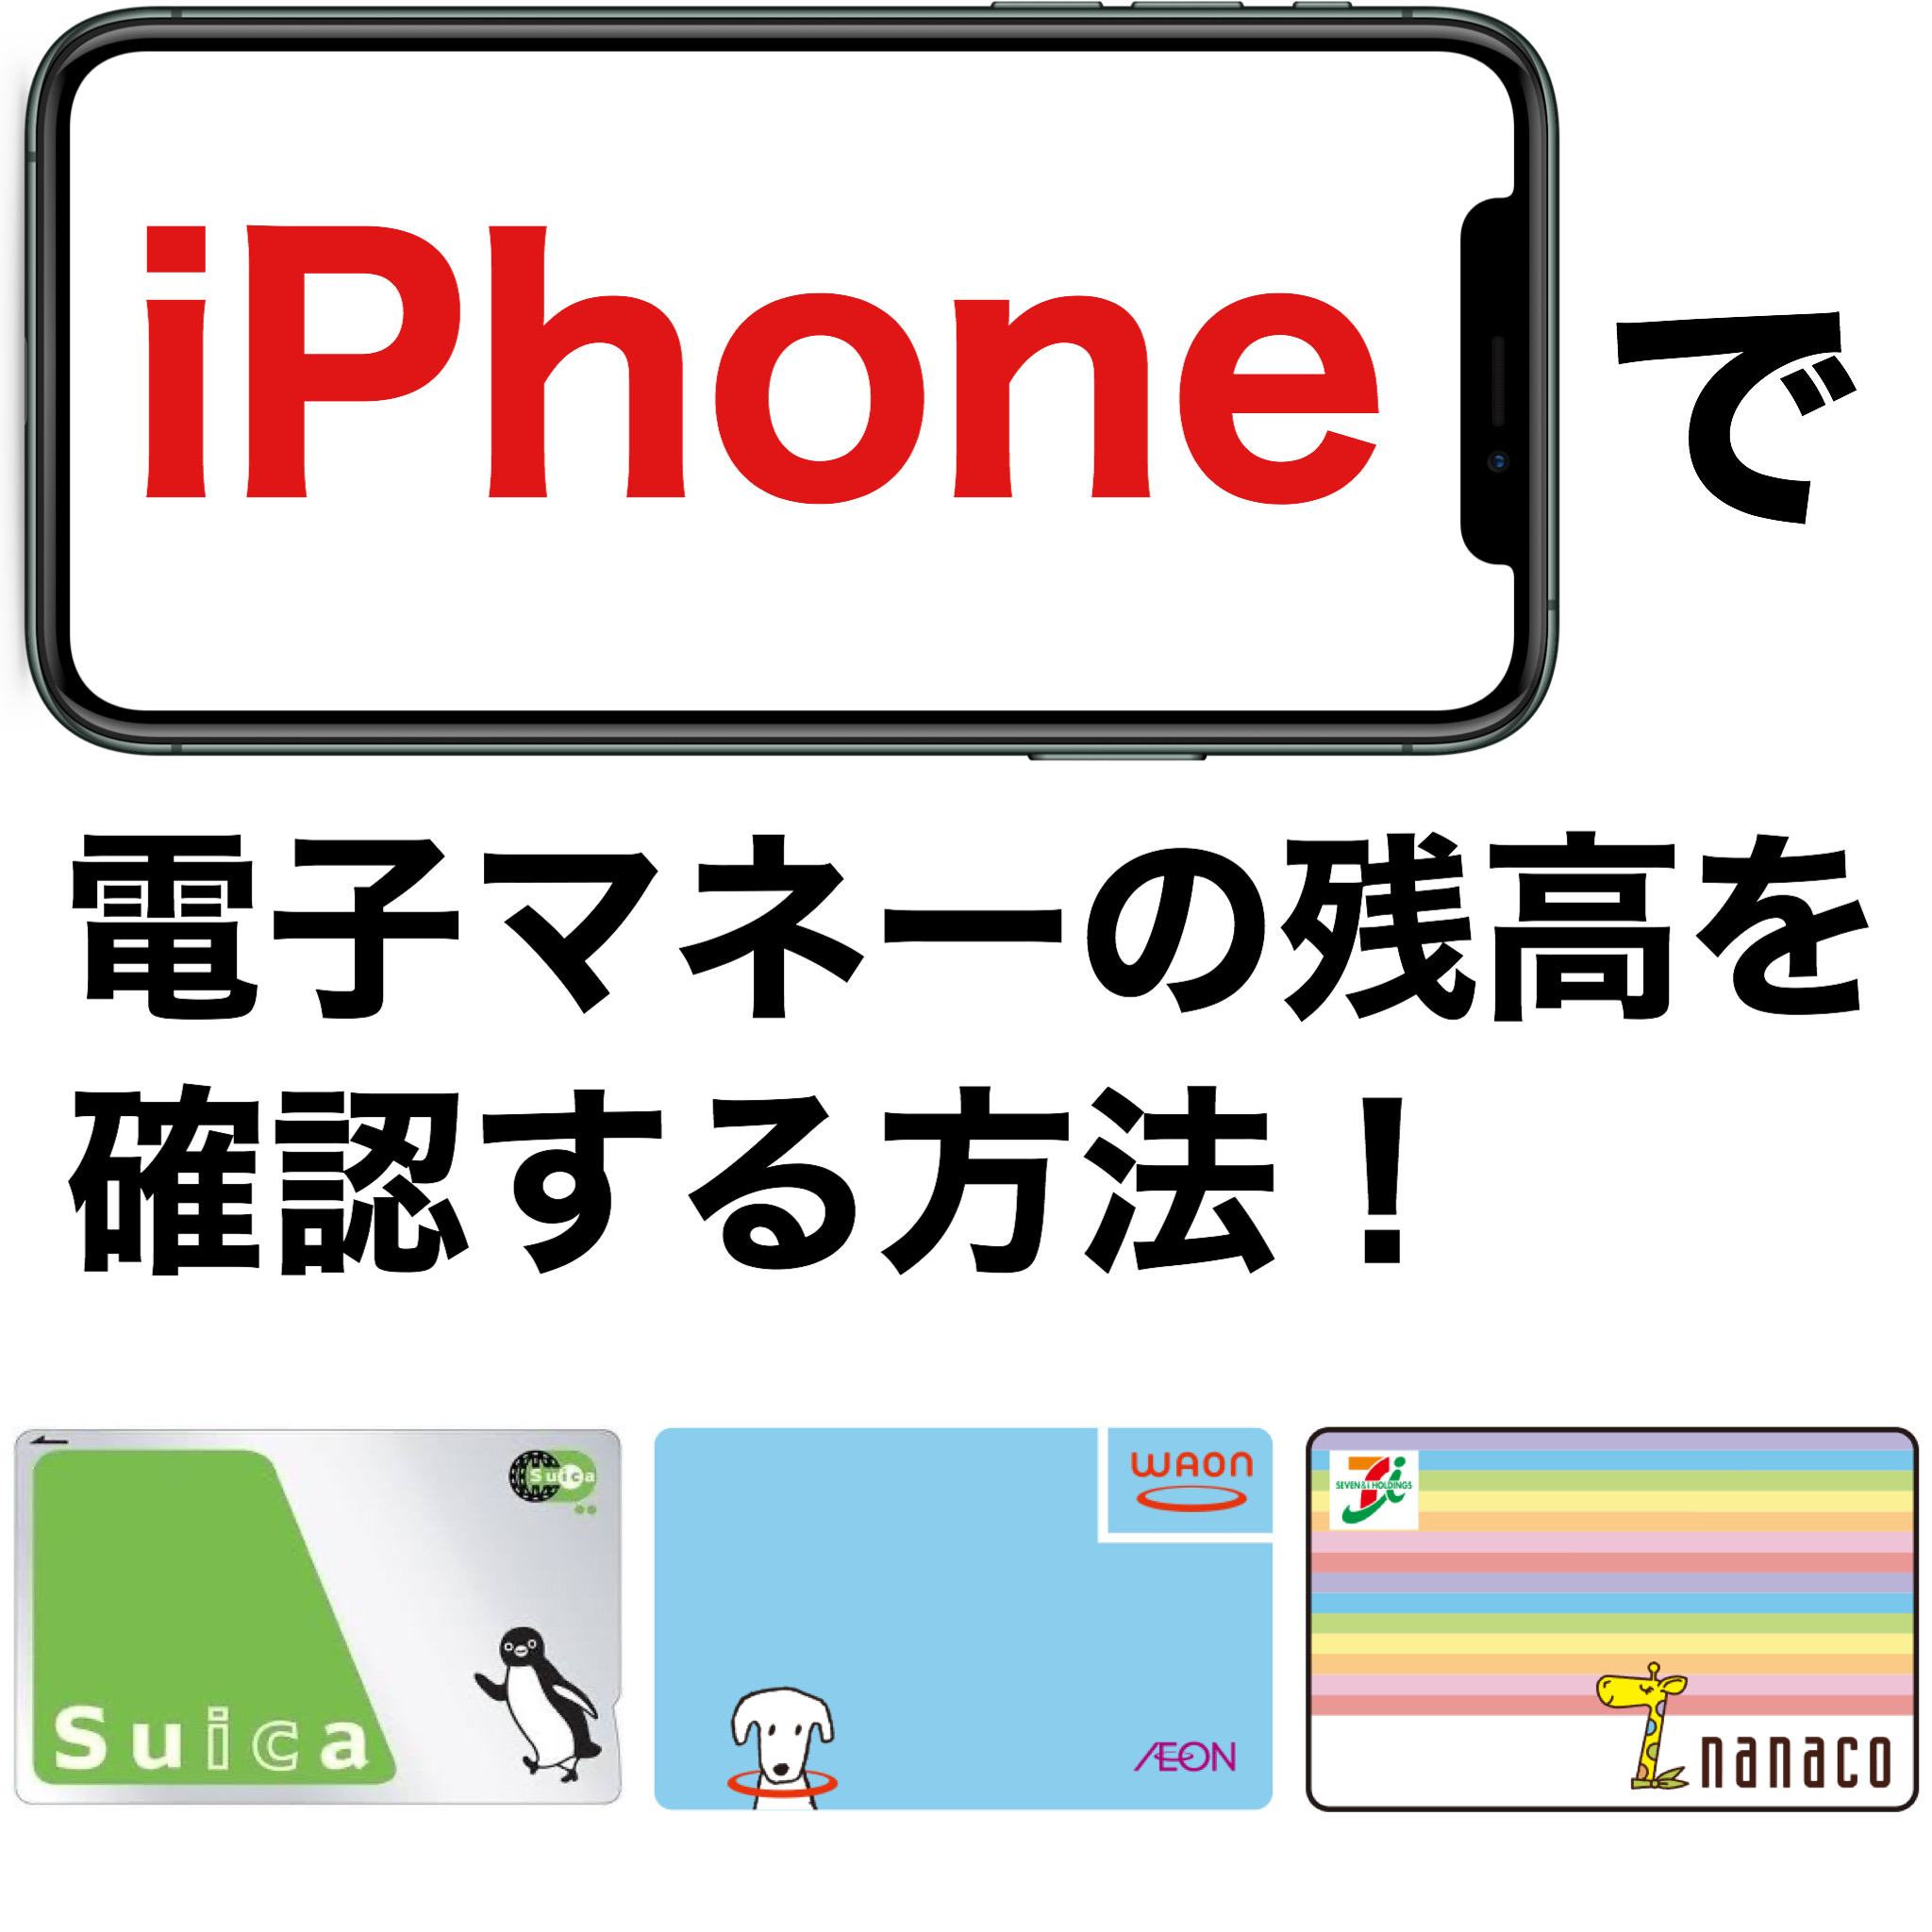 iPhoneでSuicaなどの電子マネー残高を確認する方法【iOS13以降対応】